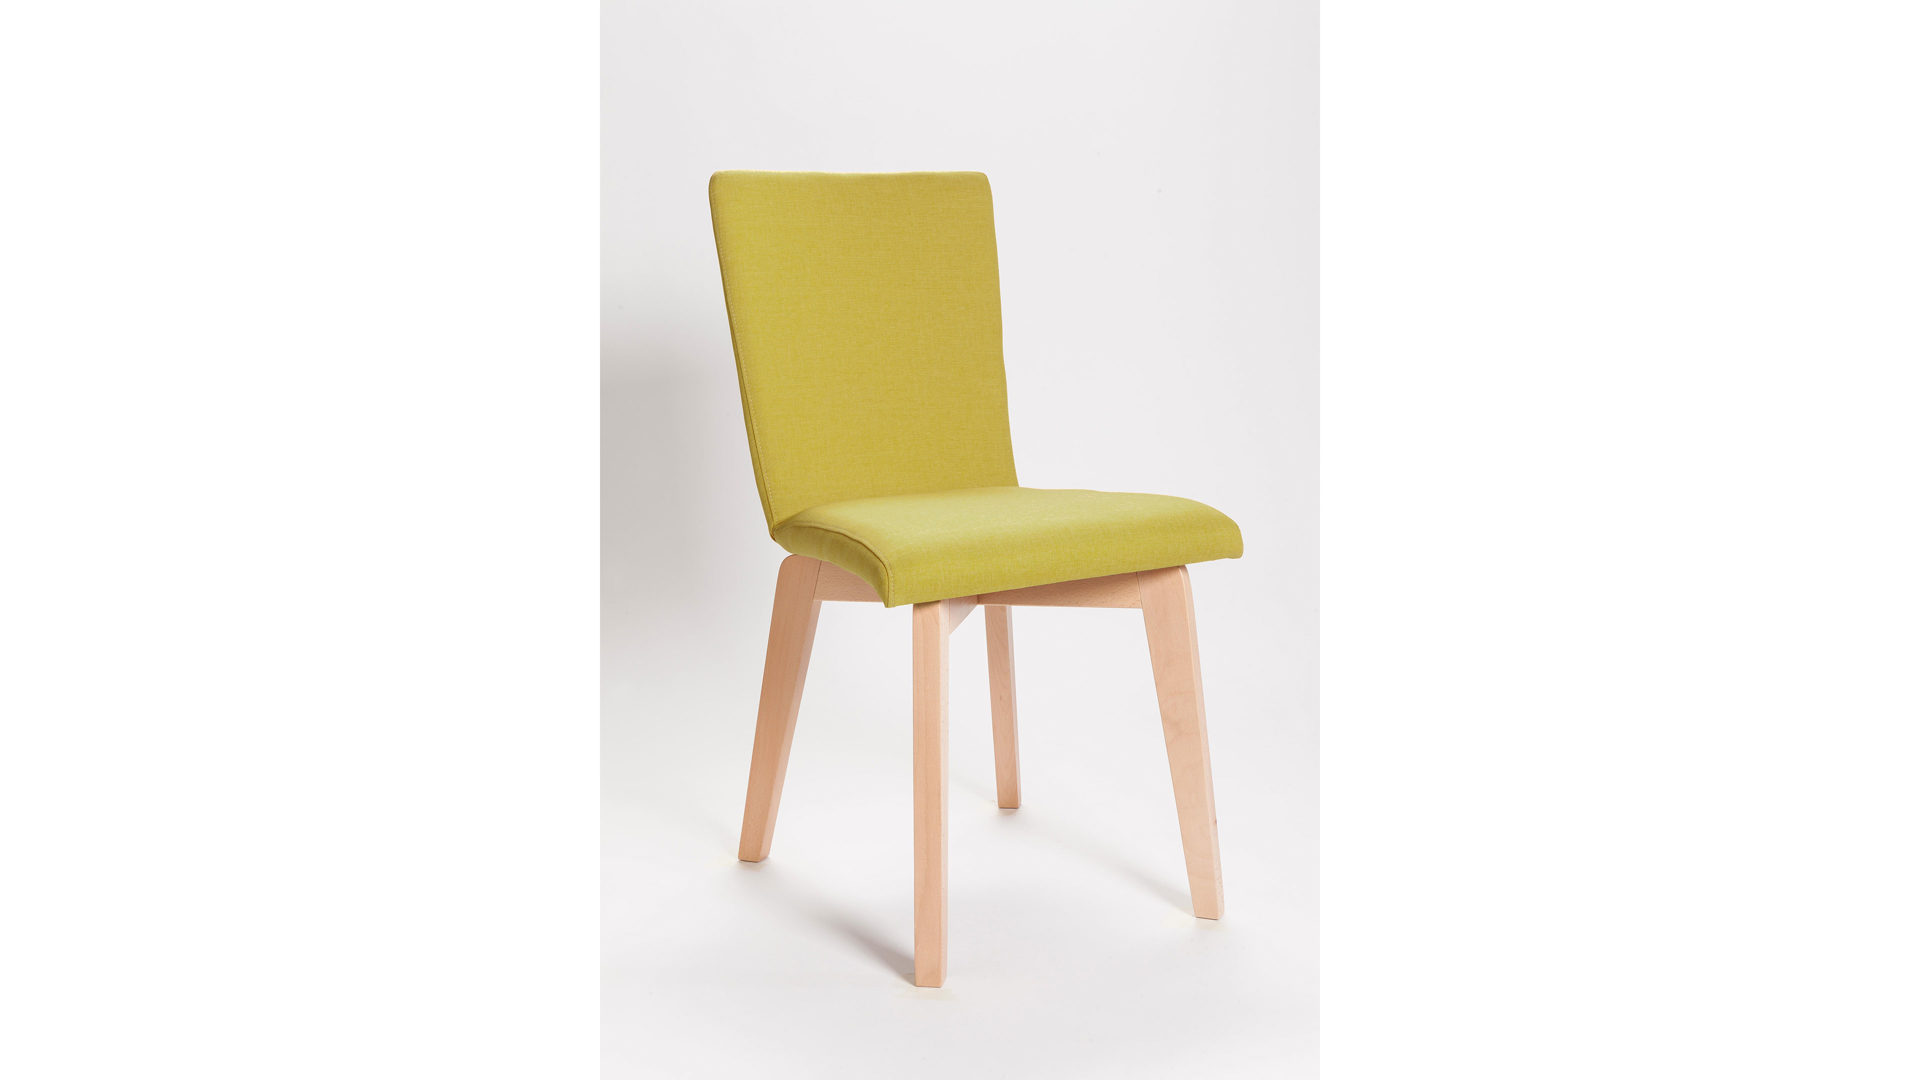 Möbel Frauendorfer Amberg Räume Küche Stühle Bänke